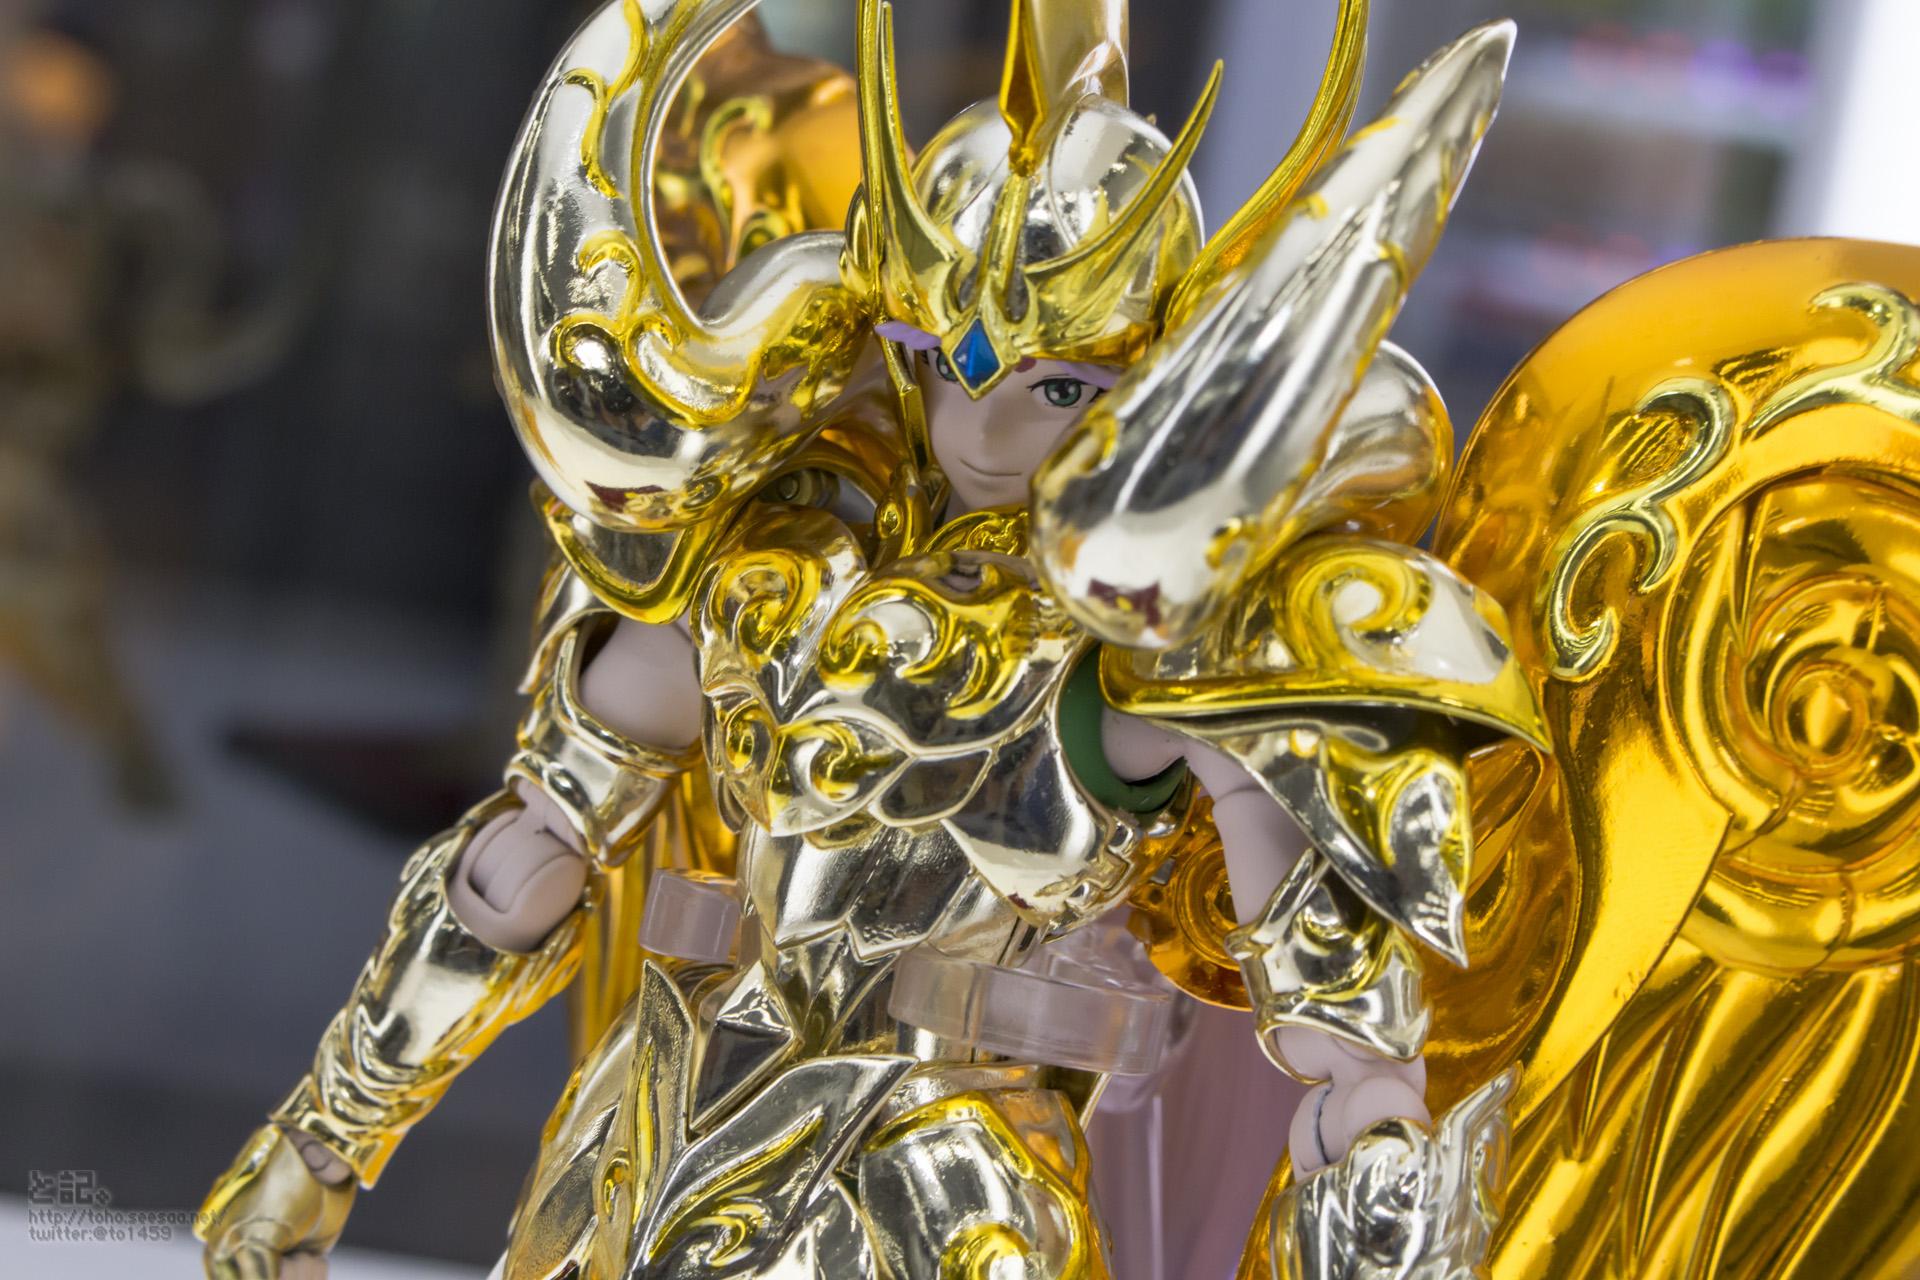 [Comentários]Saint Cloth Myth EX - Soul of Gold Mu de Áries - Página 3 EnvHD5Ah